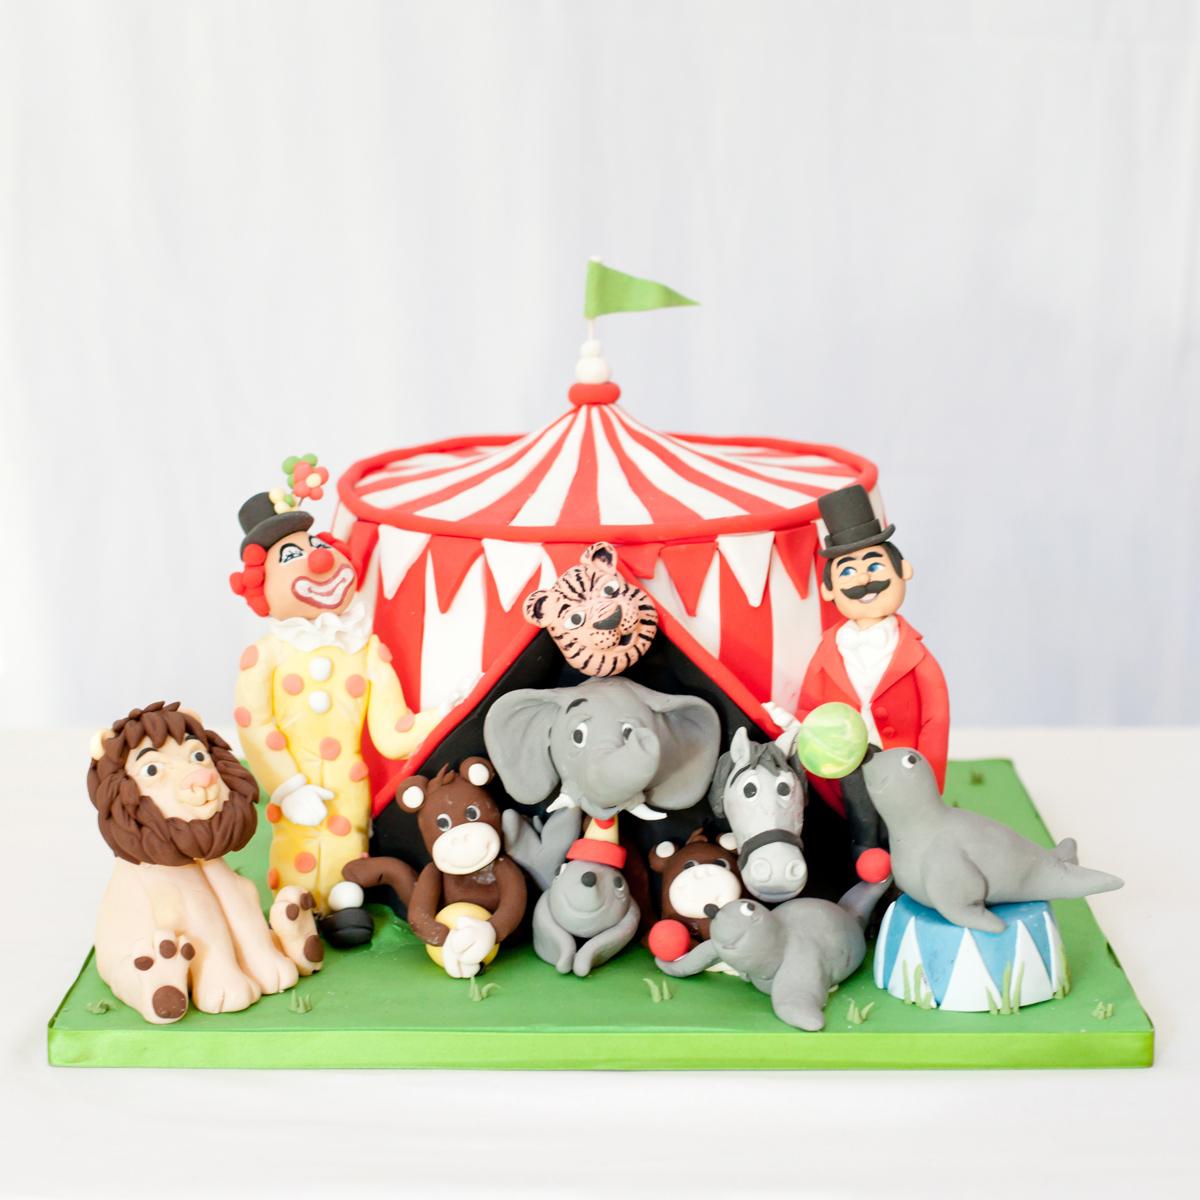 Circus Animal Cake Pops